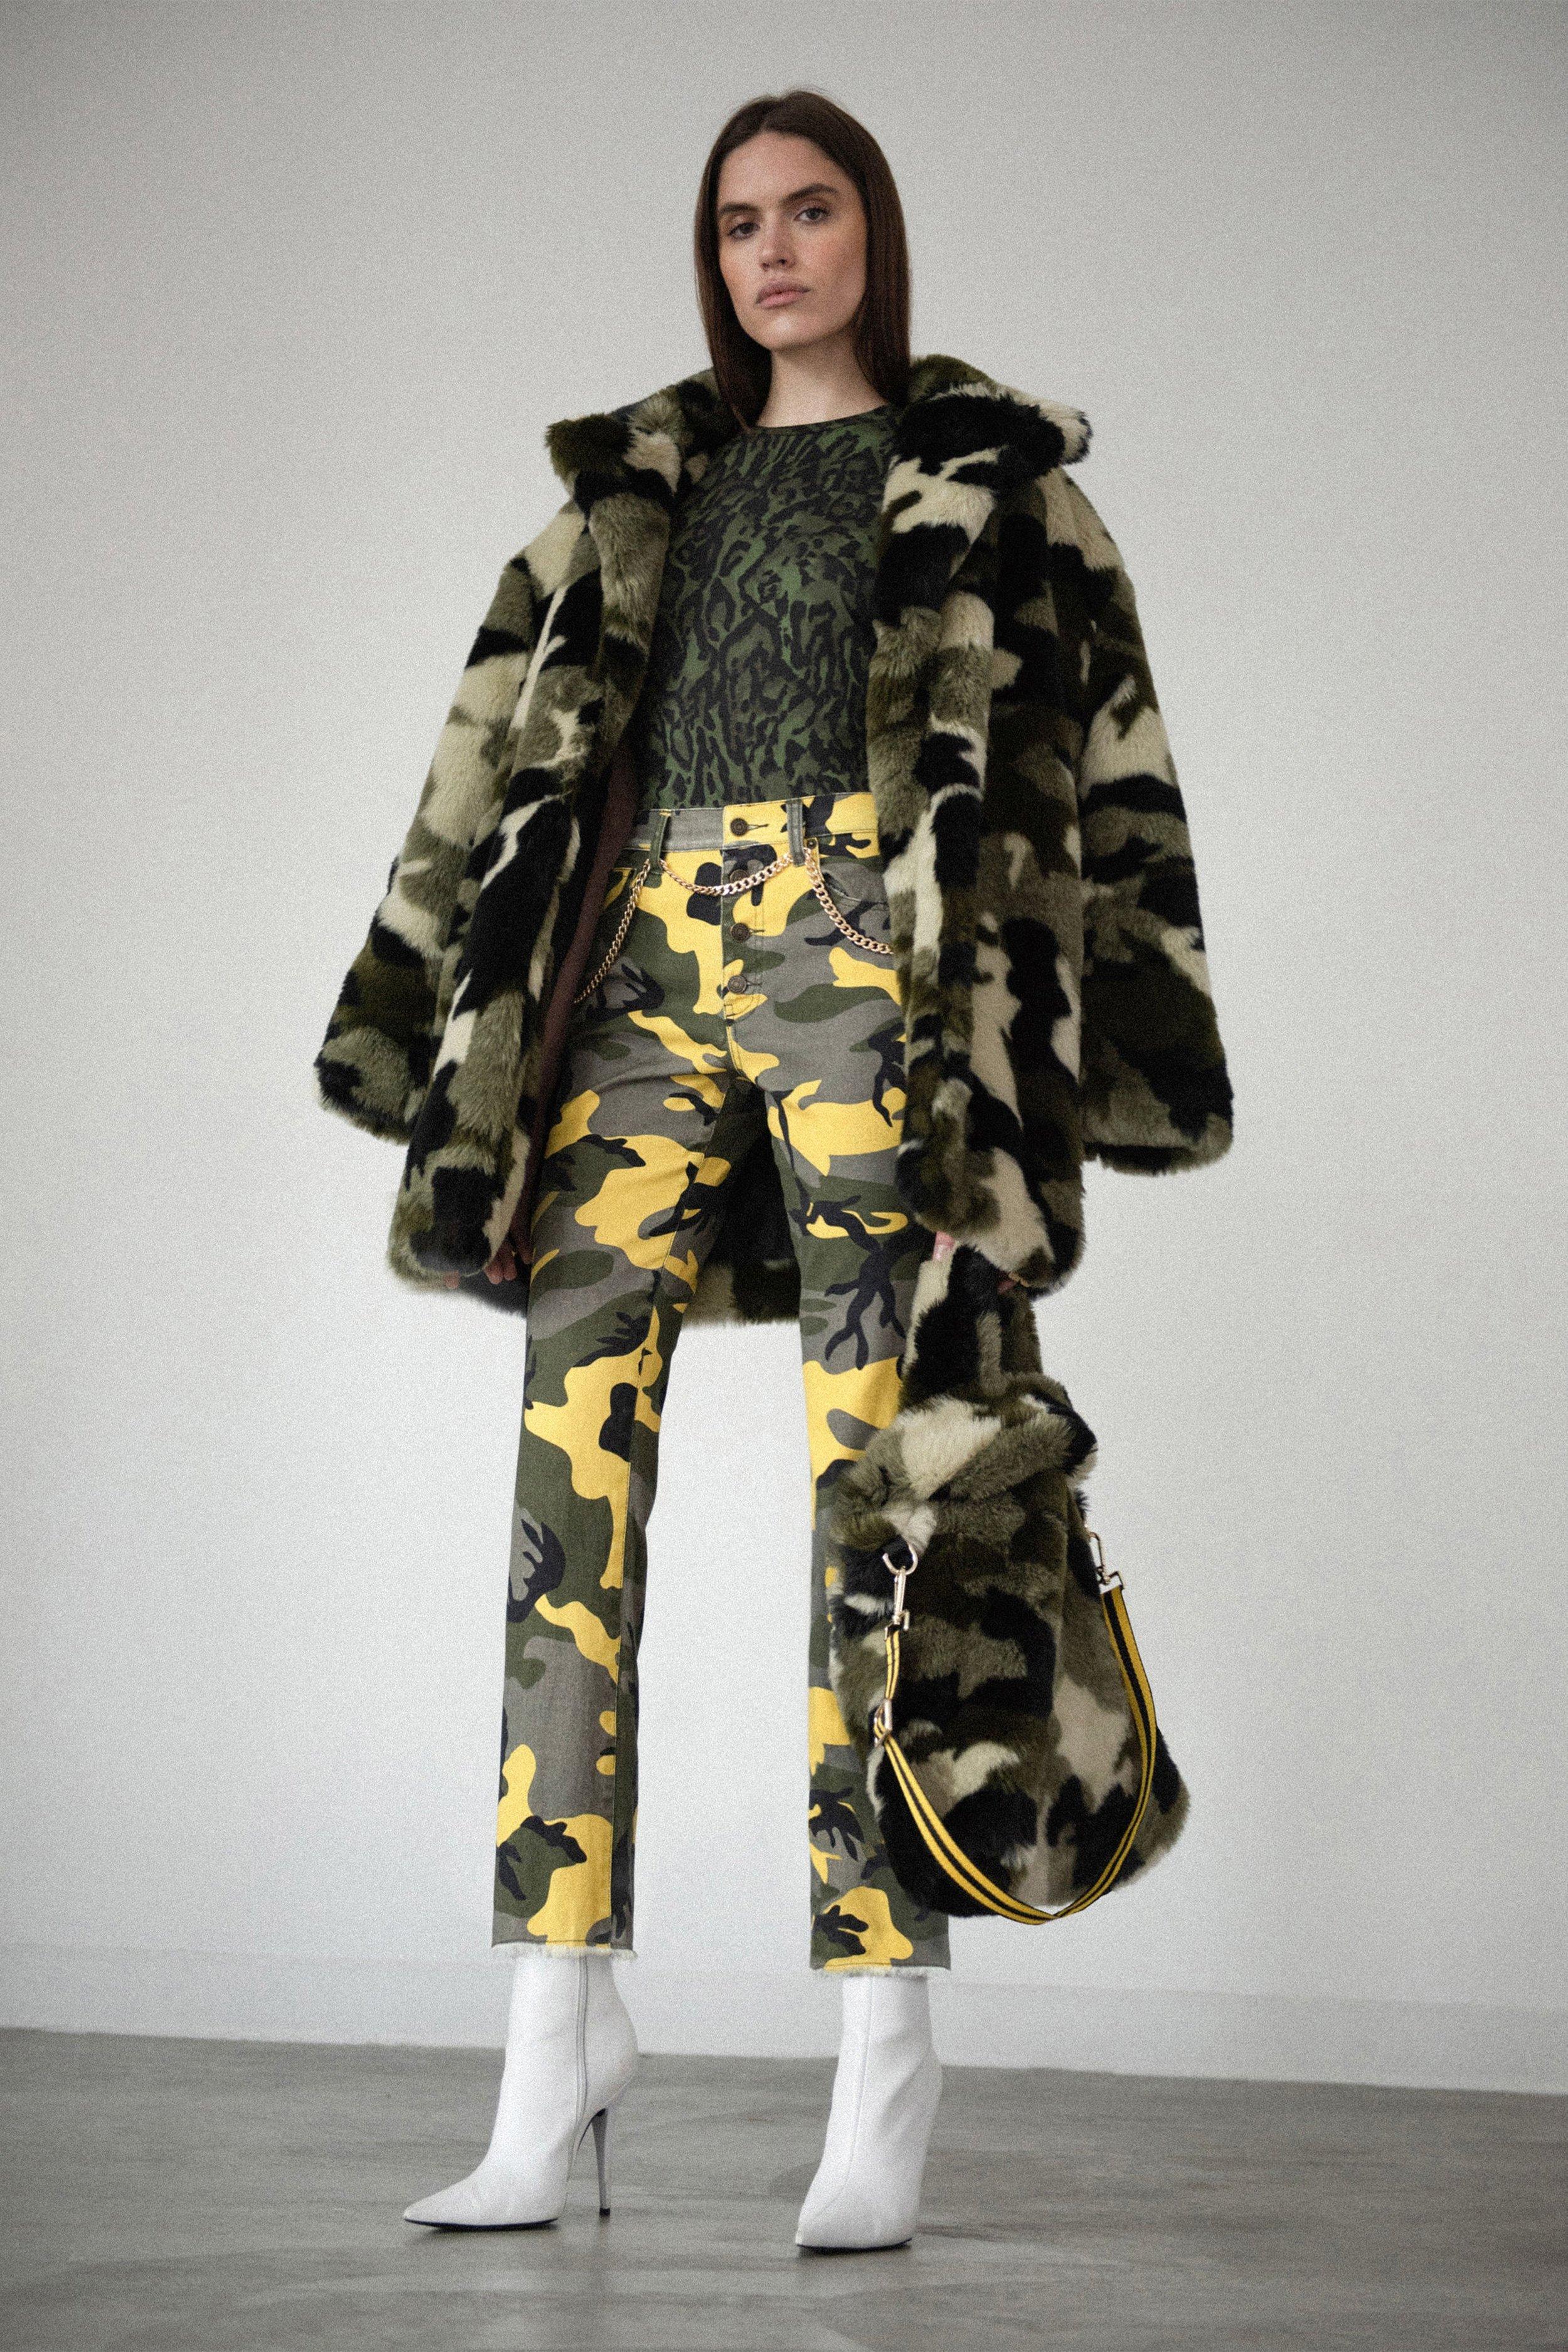 00001-Pam-and-Gela-Fall-2019-ready-to-wear.jpg